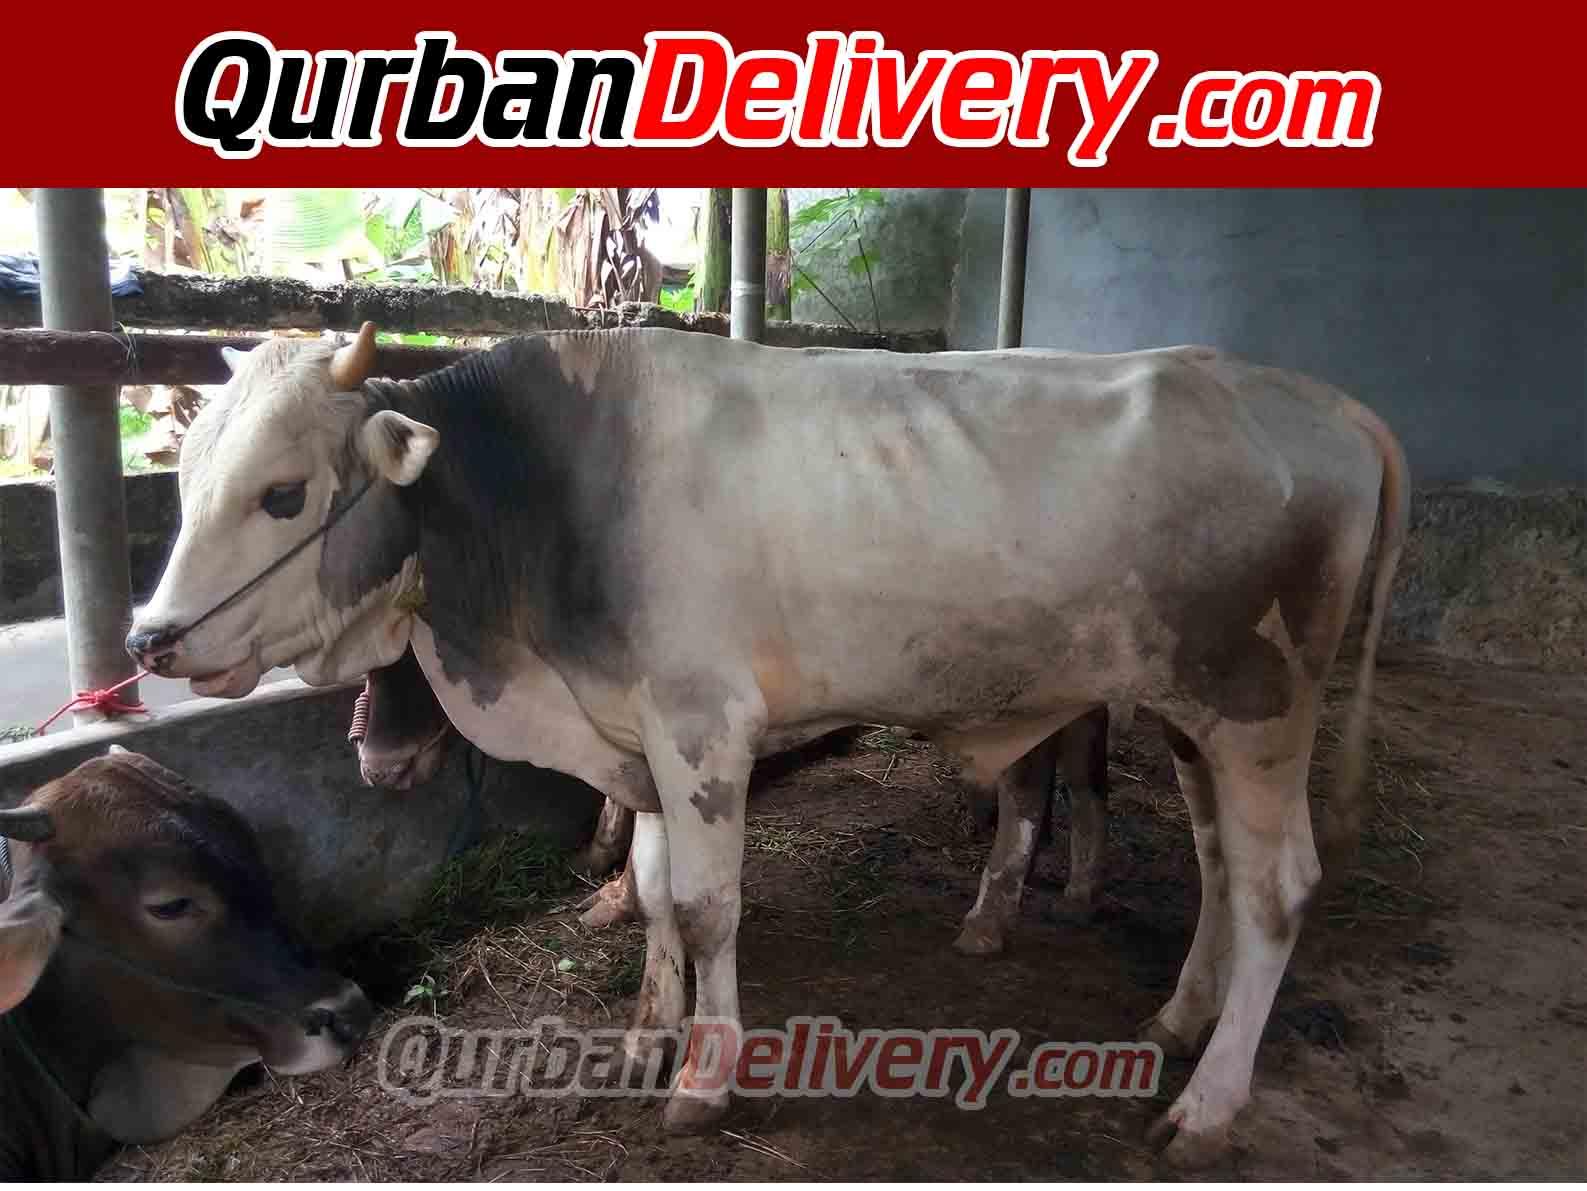 Harga Sapi Limosin Qurban Jabodetabek Prediksi 2020-Qurban Delivery